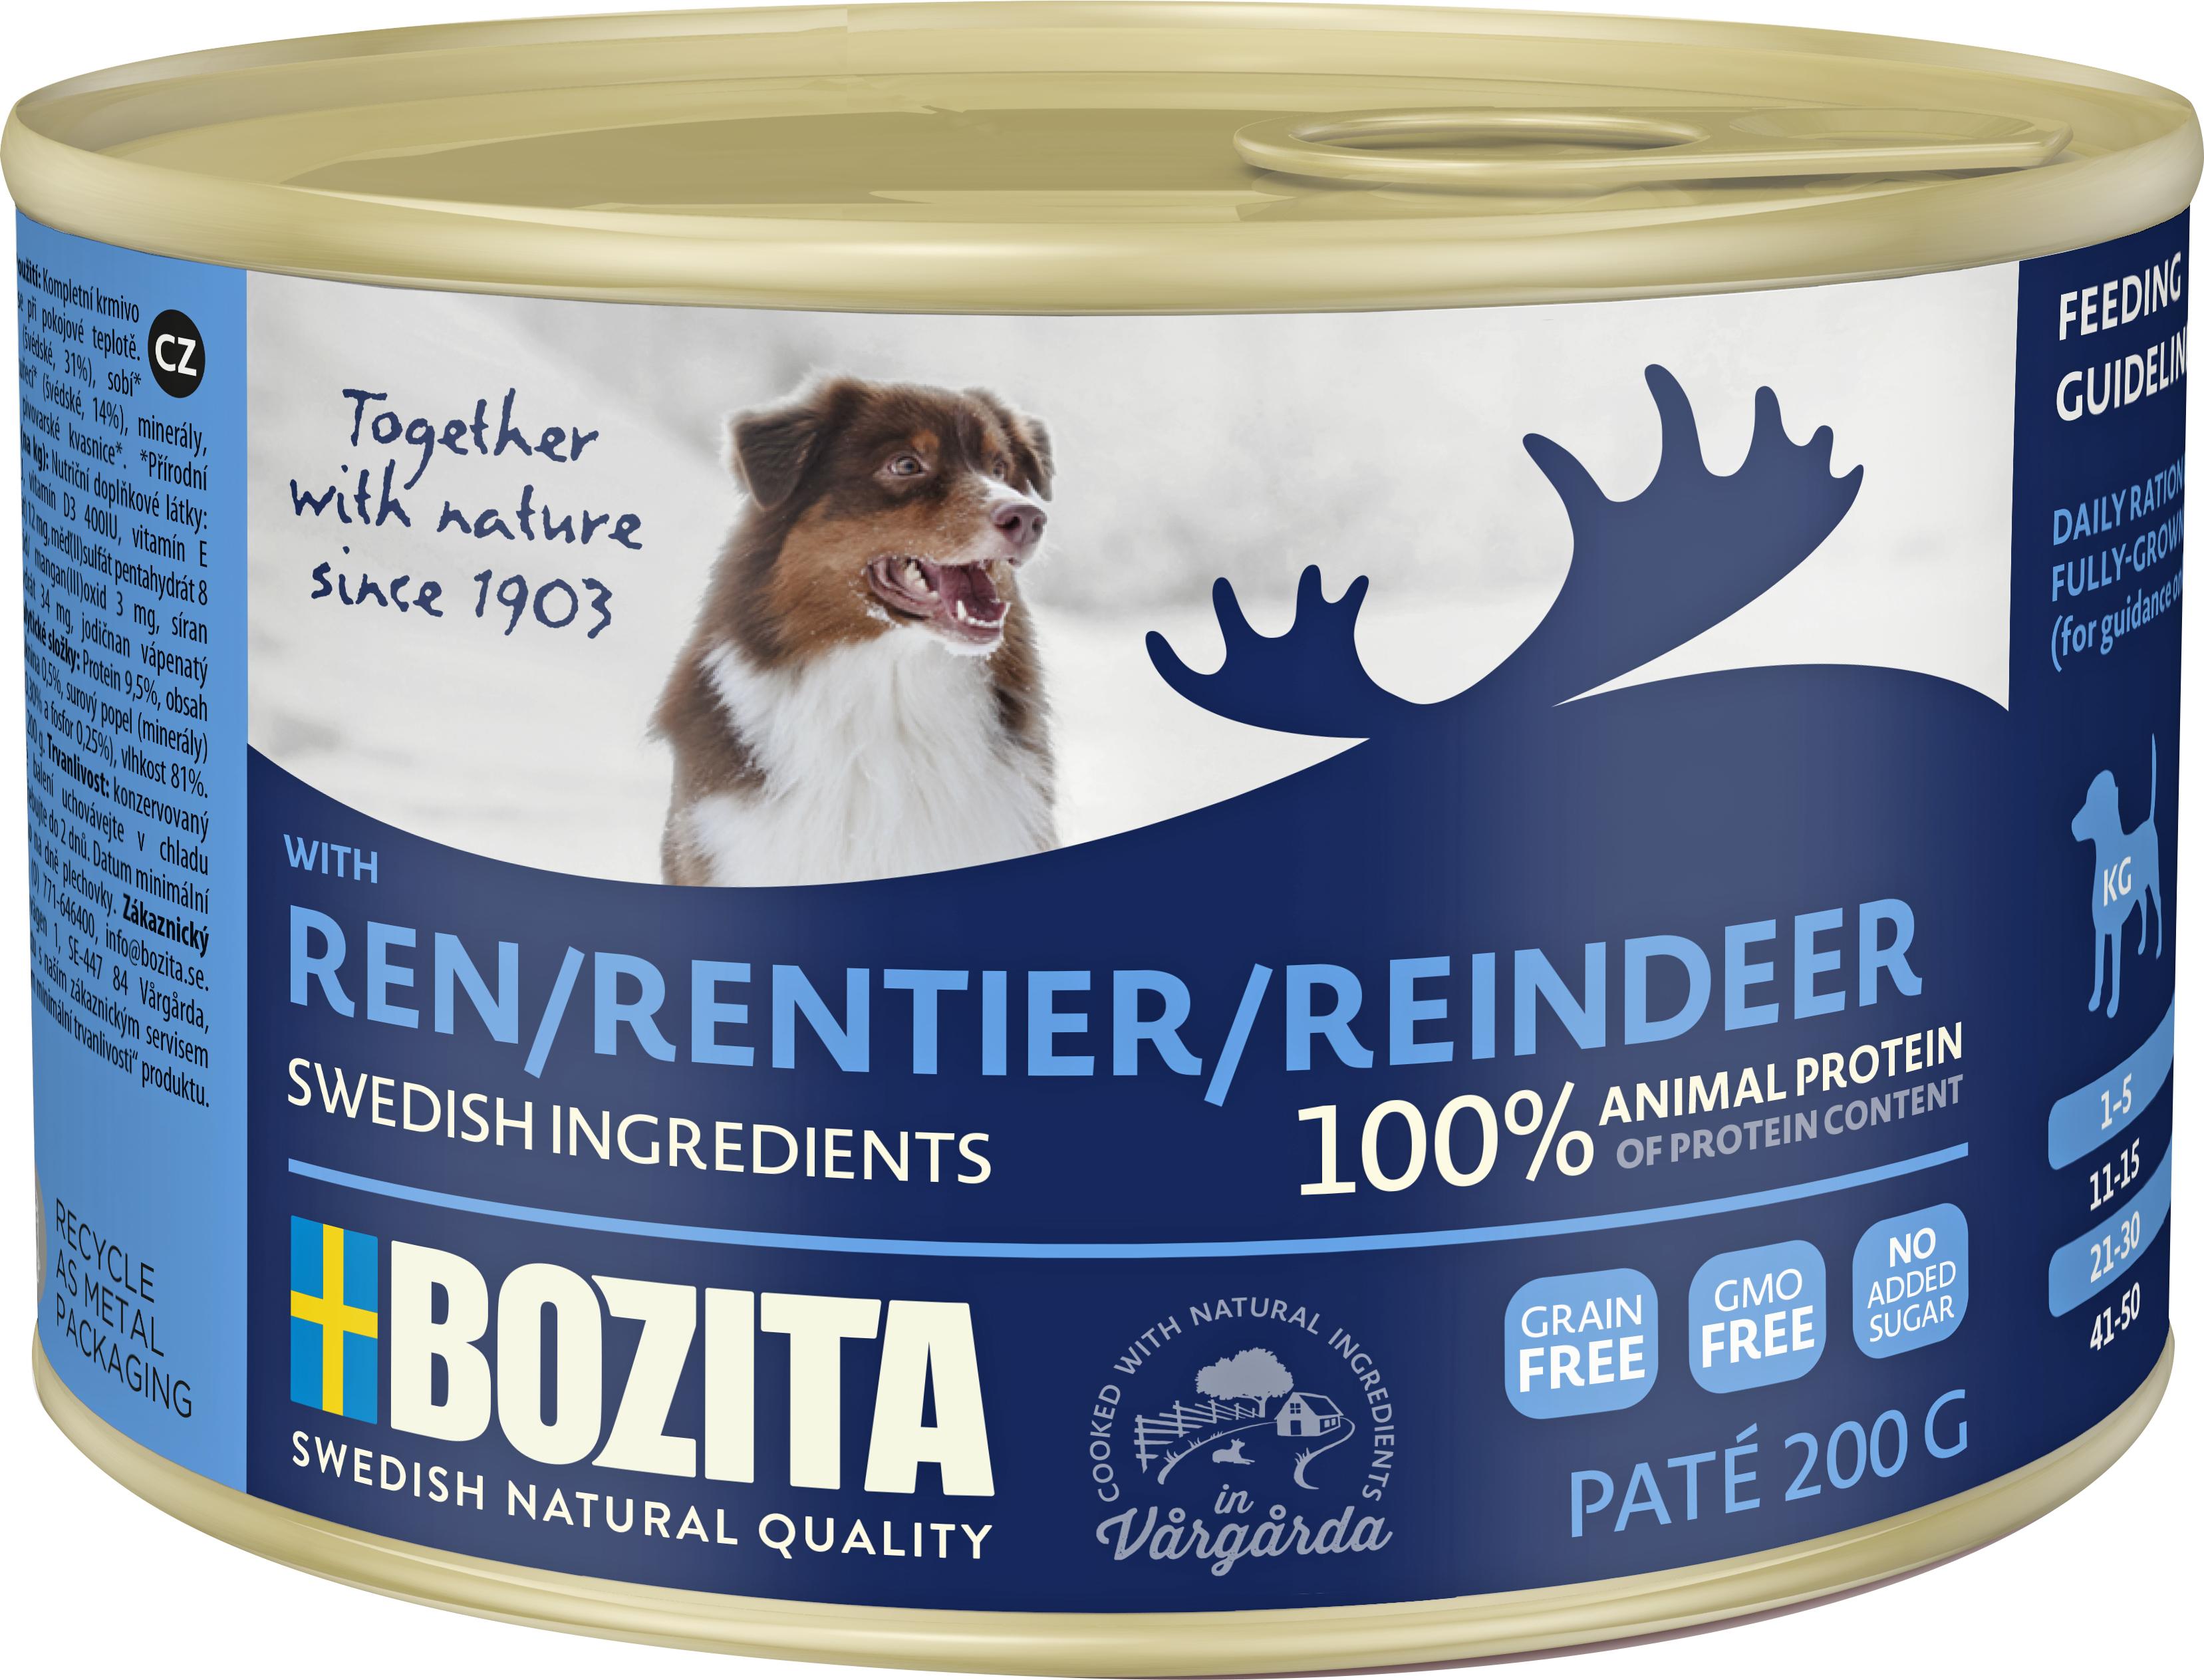 Hundfoder Bozita Ren Konserv 200 gram